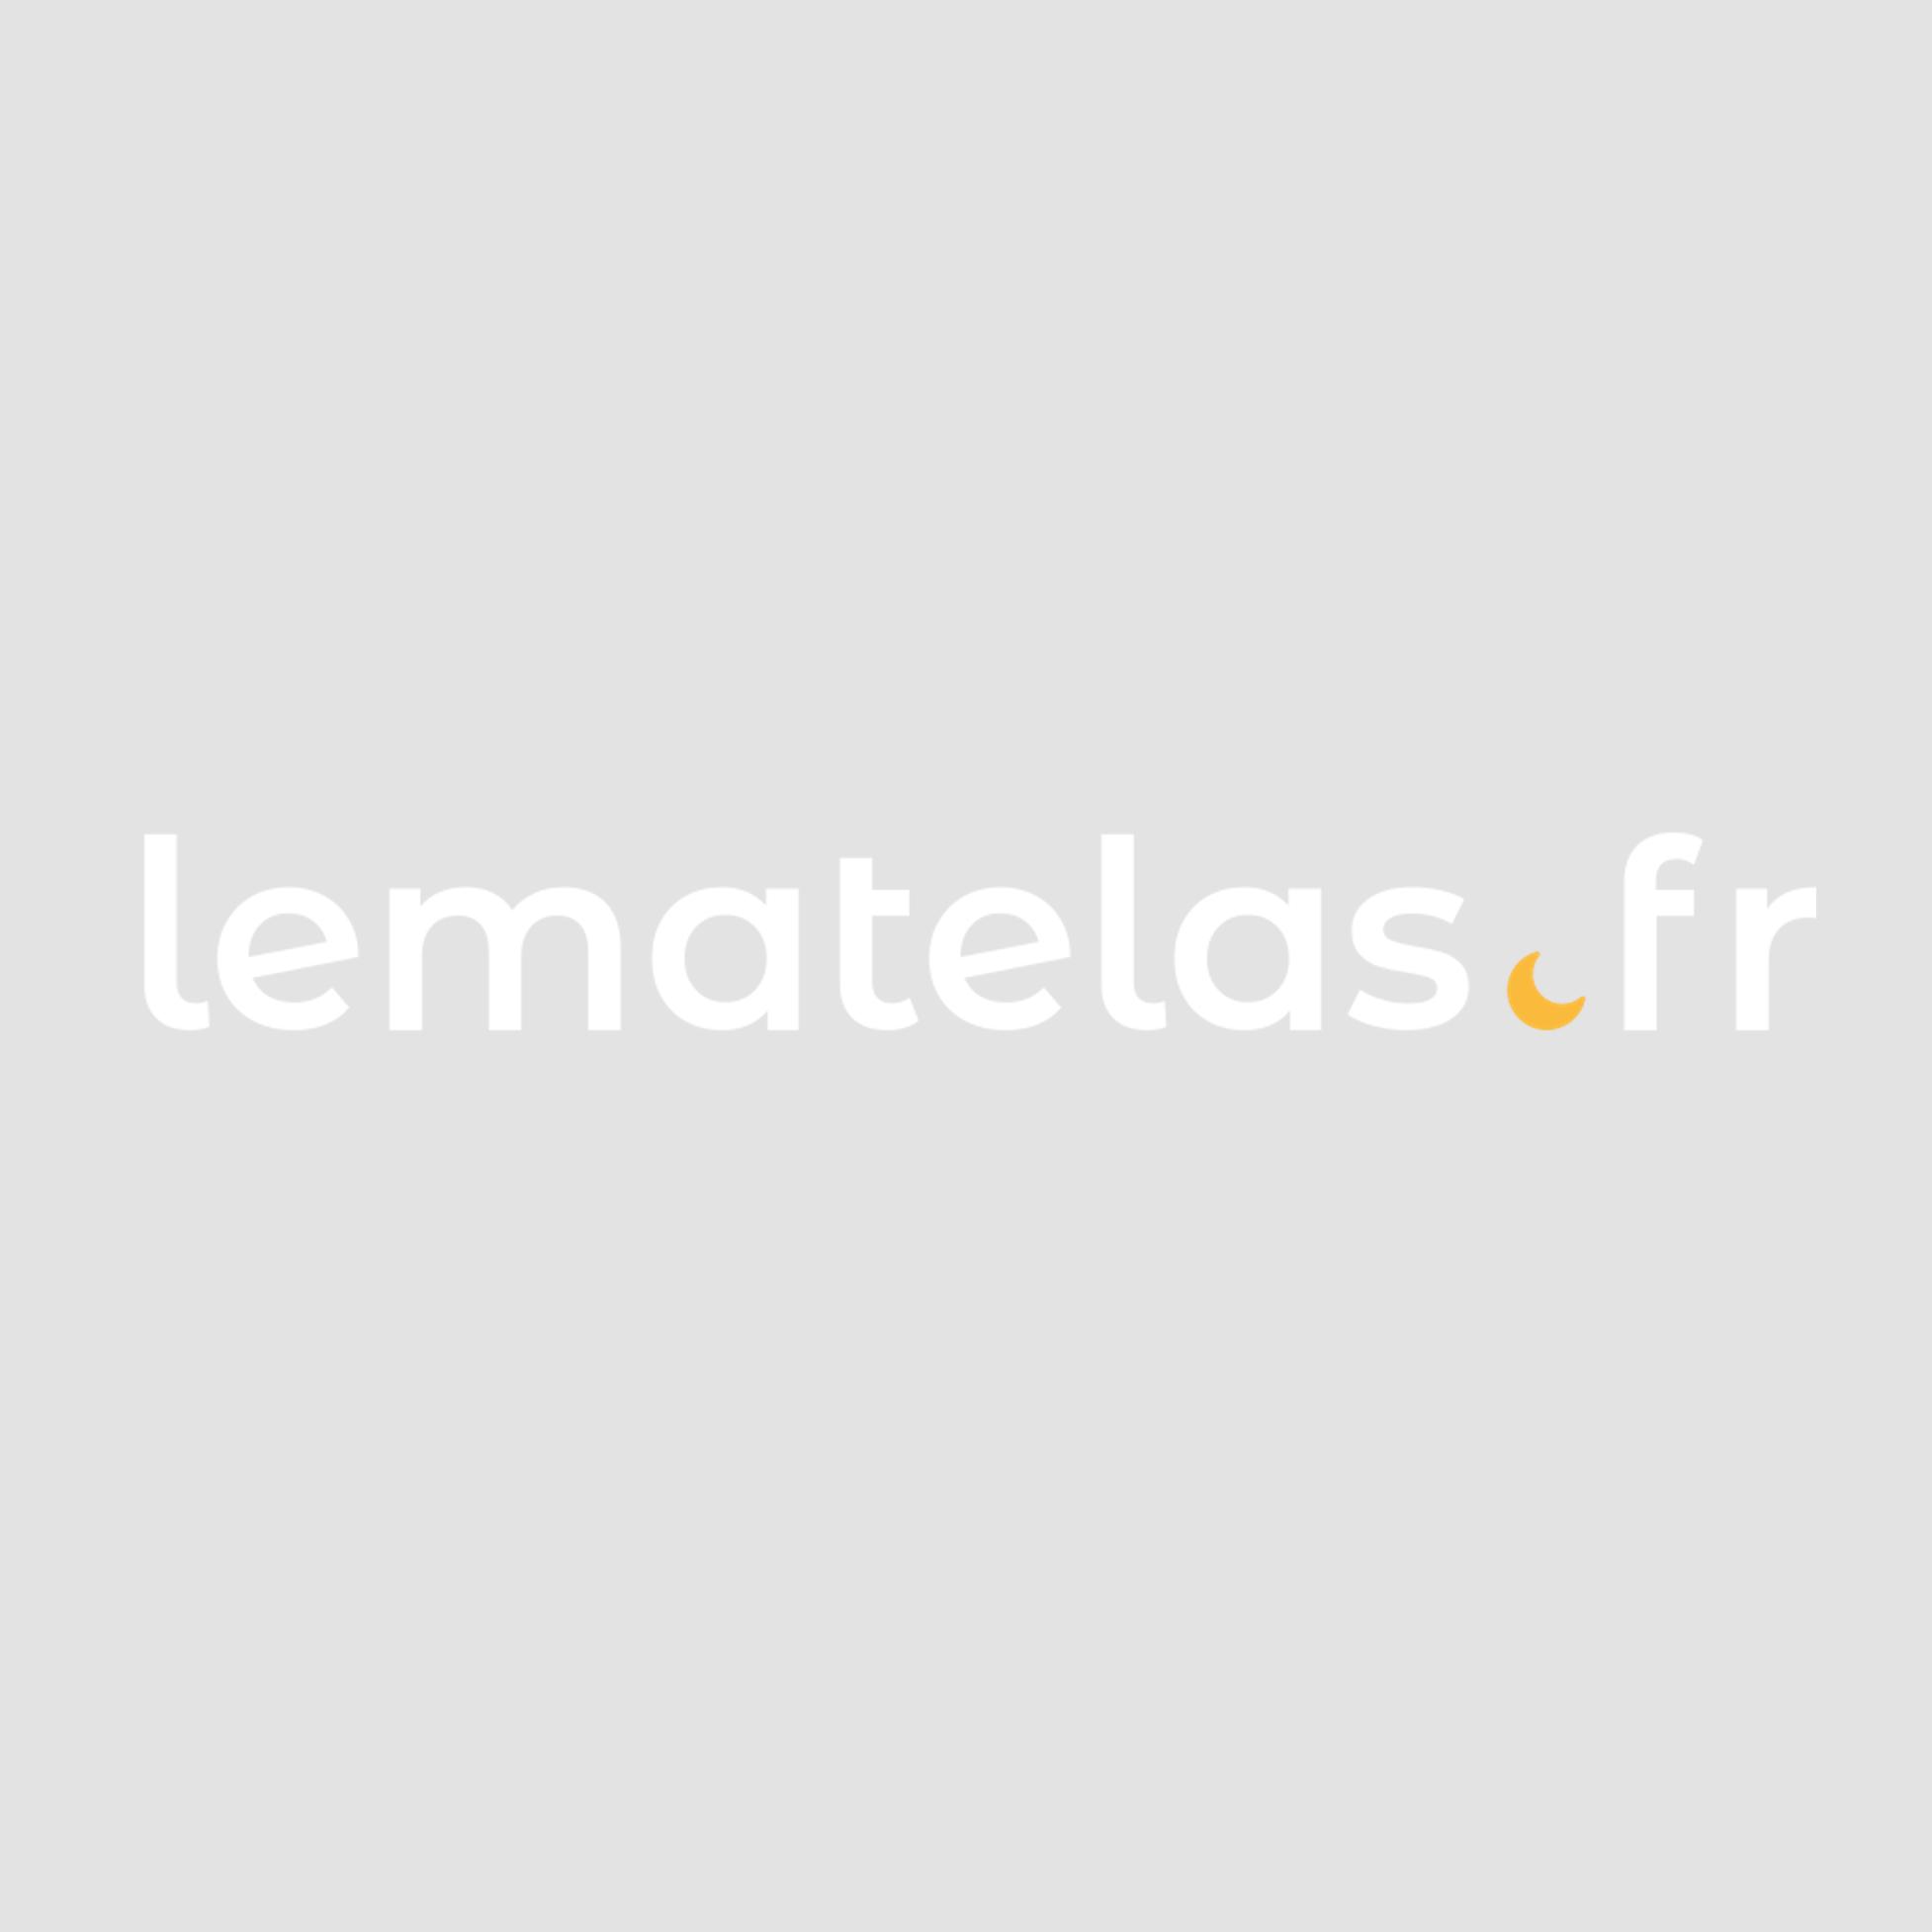 220 guide d 39 achat. Black Bedroom Furniture Sets. Home Design Ideas